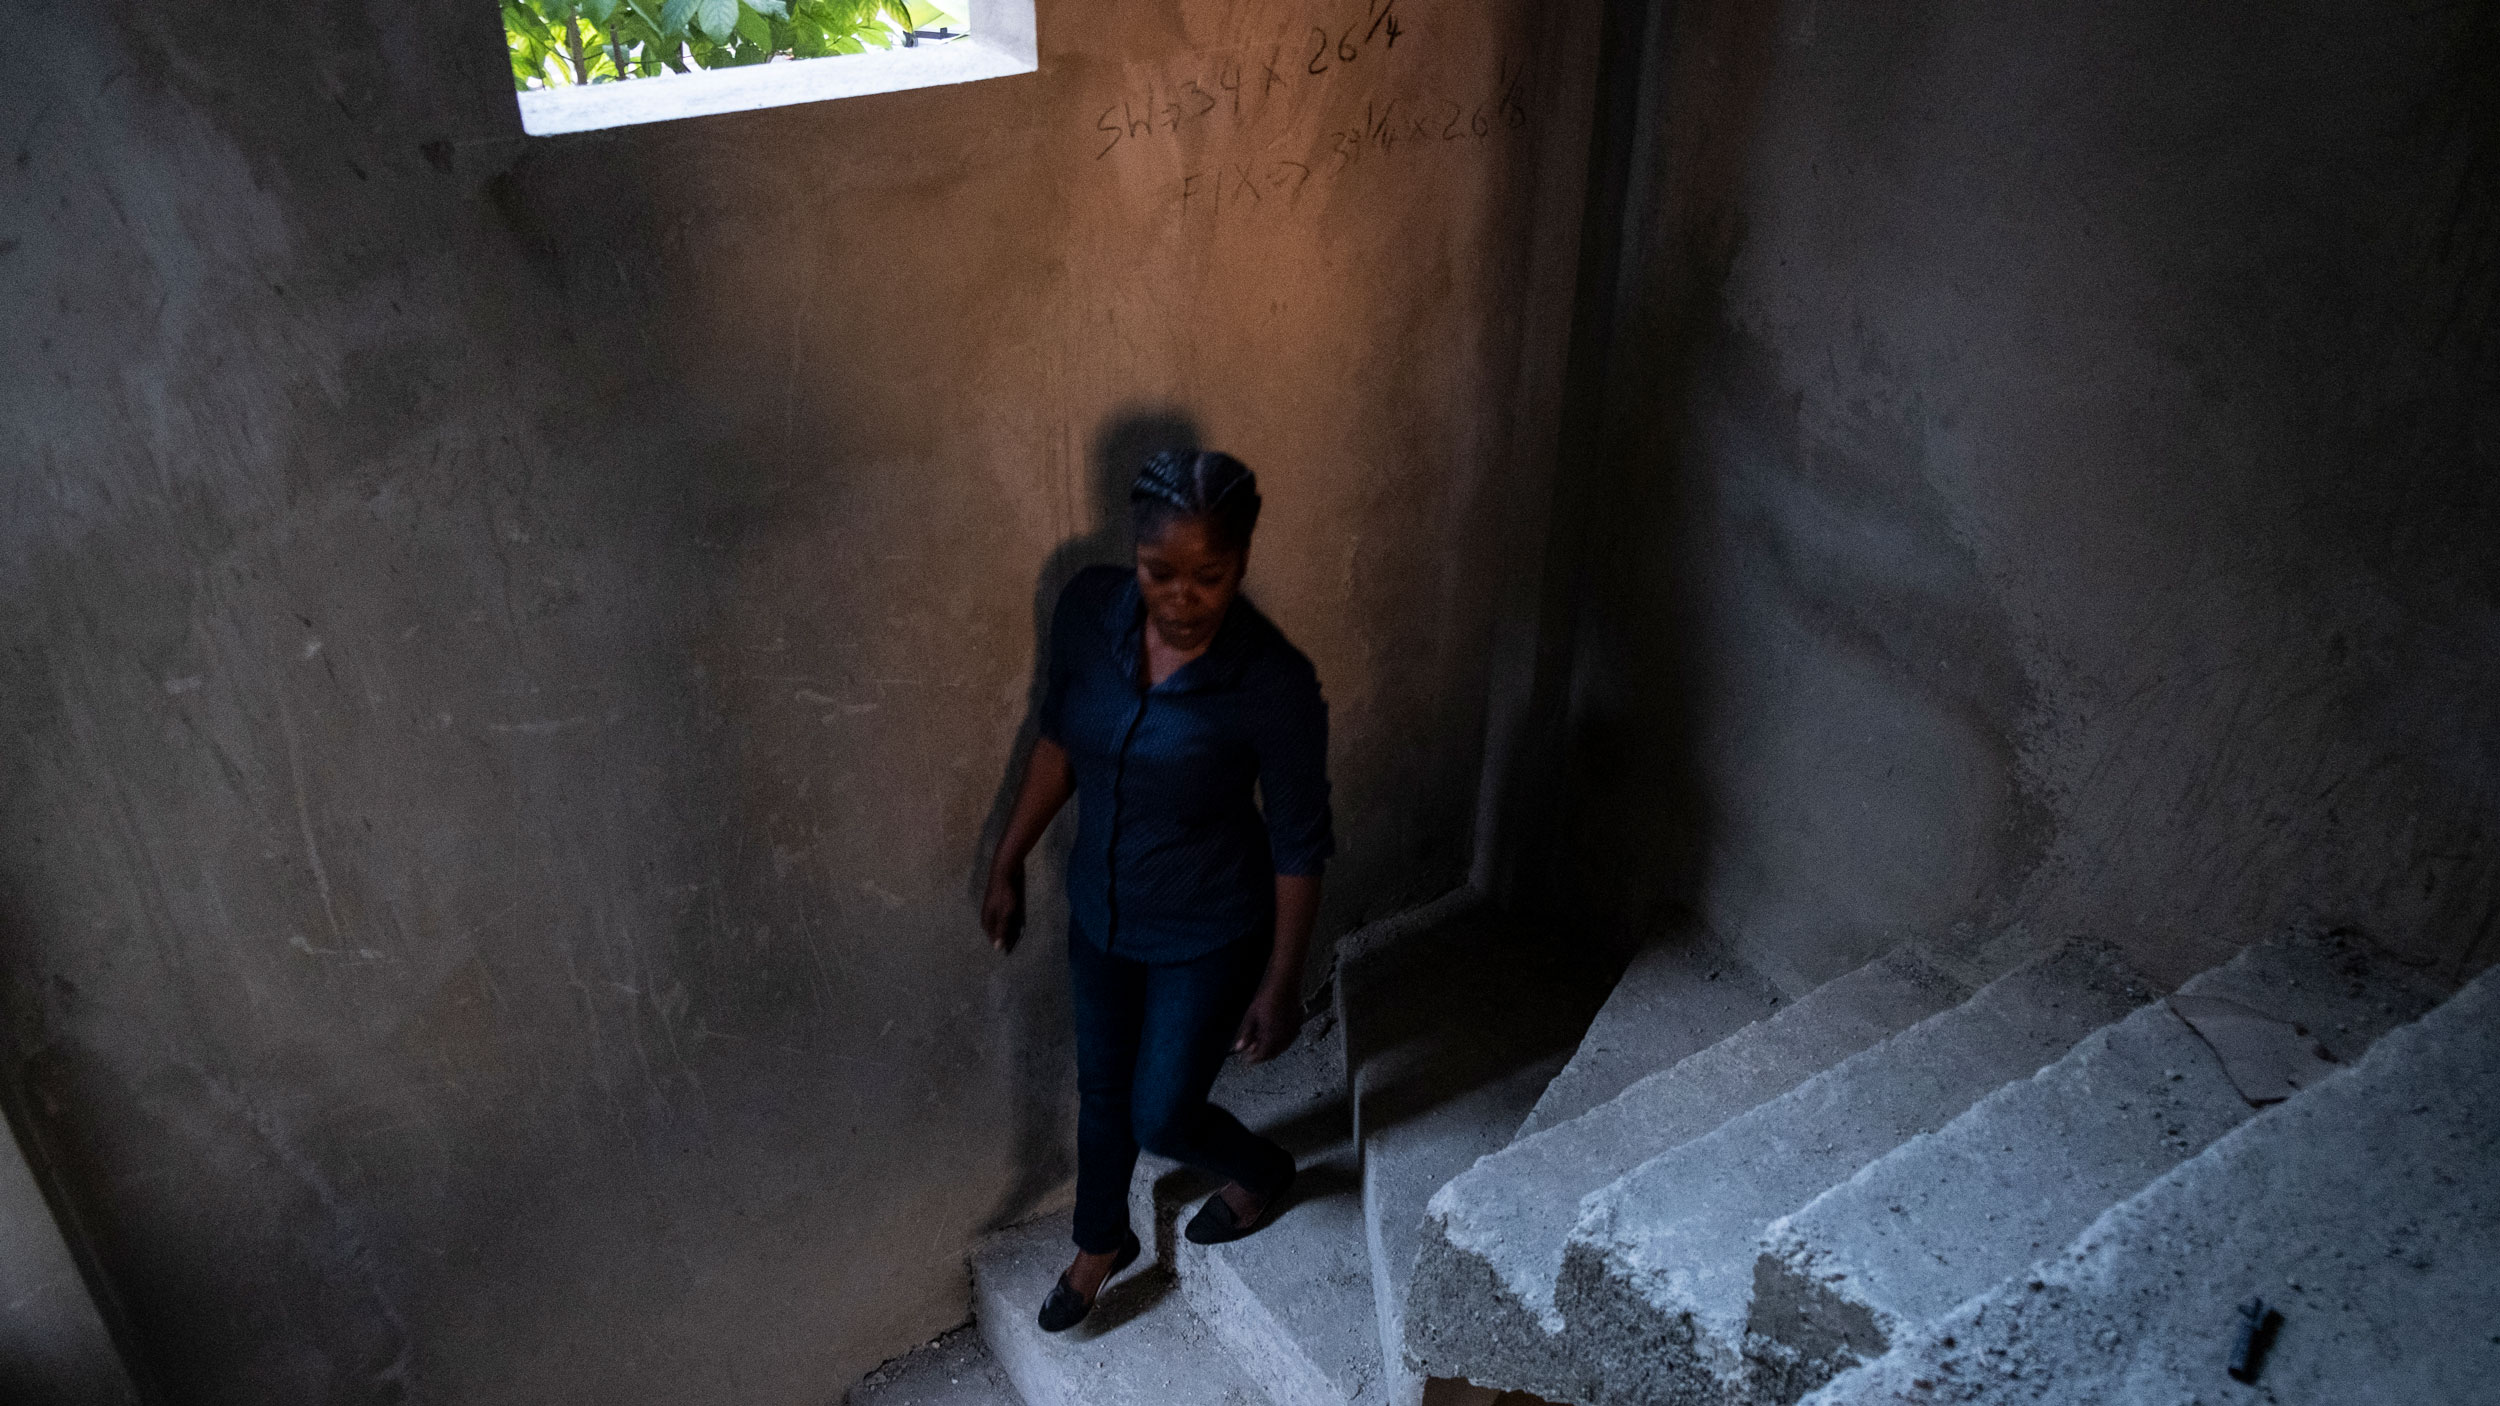 A woman is shown walking down a cement staircase in Port-au-Prince, Haiti.